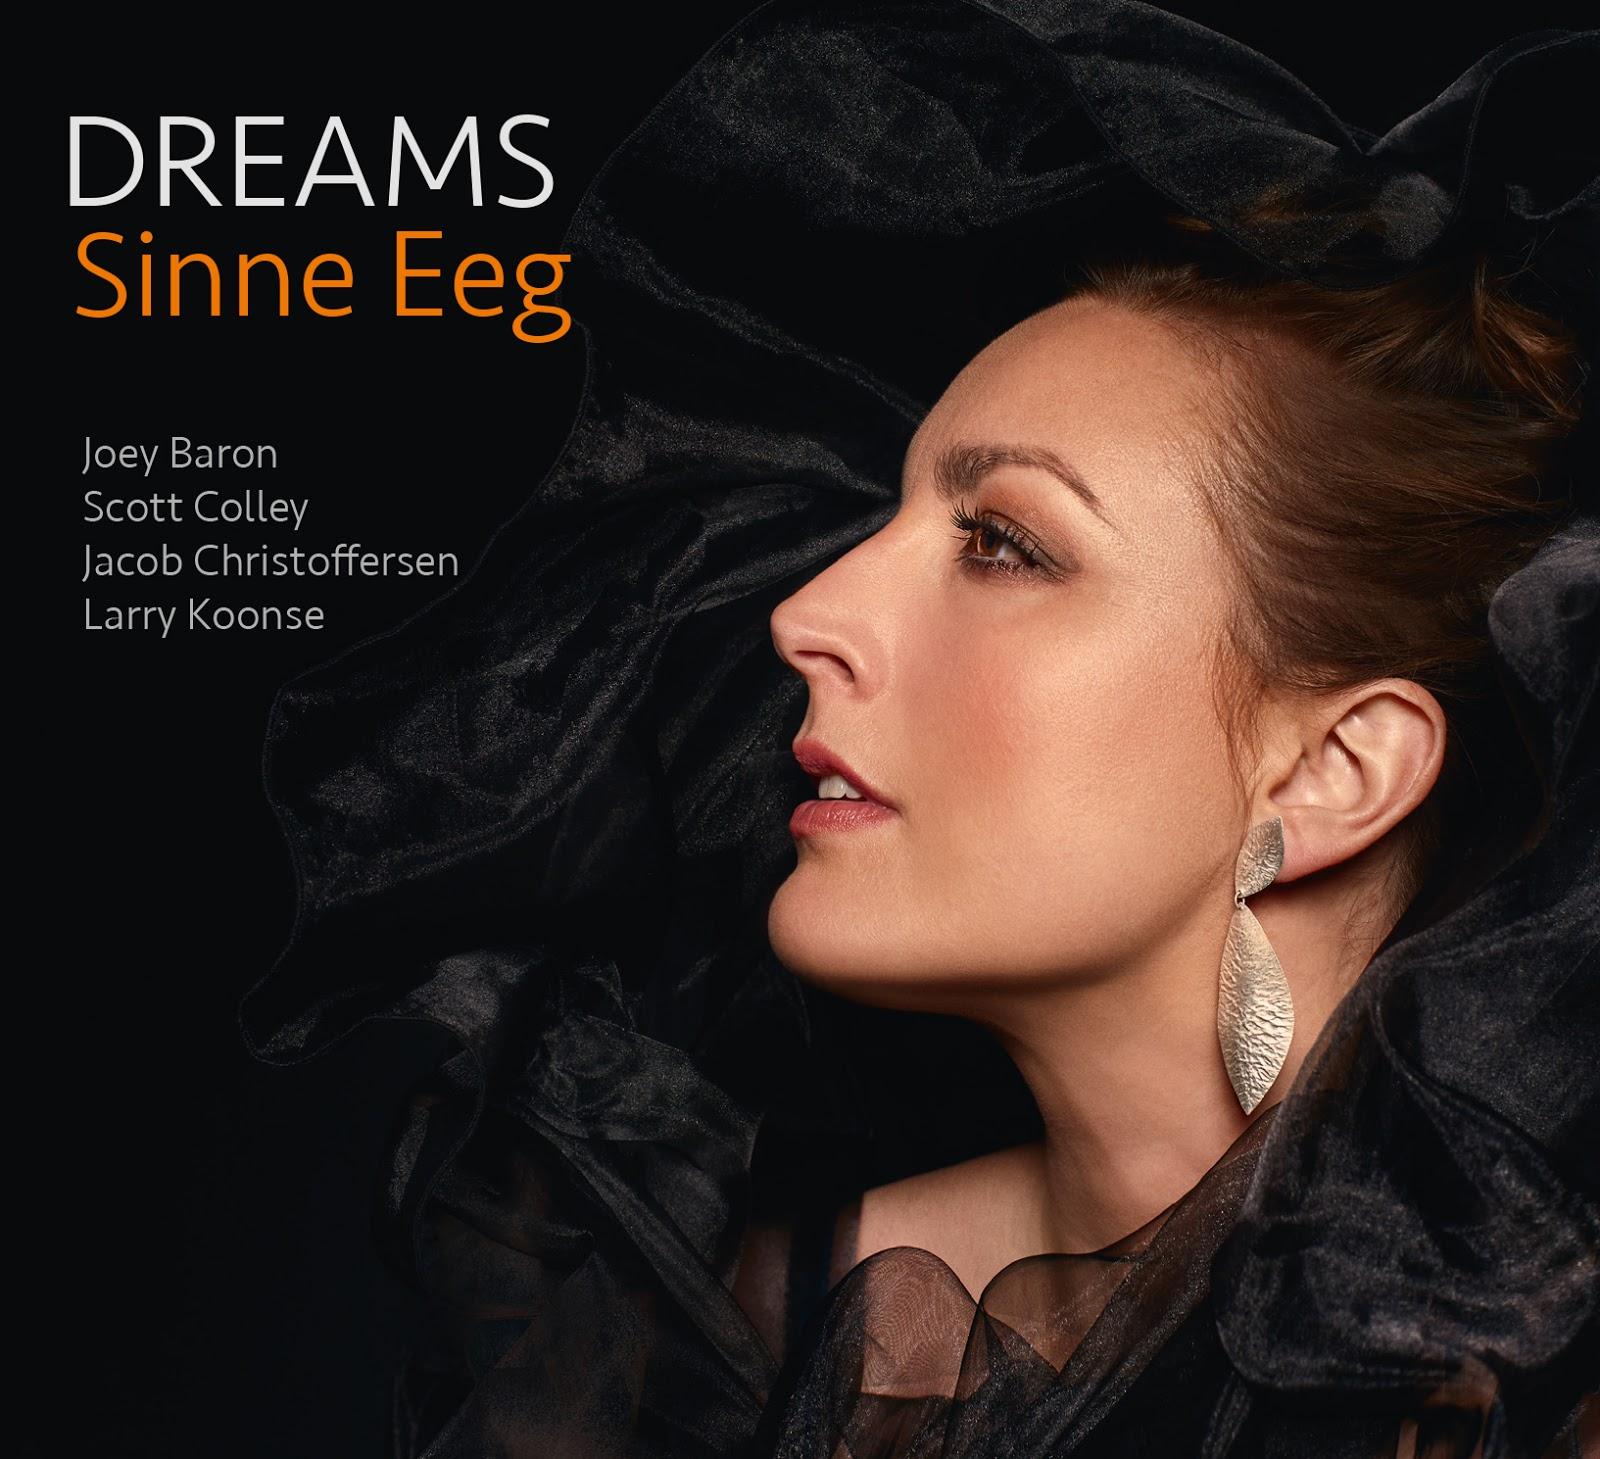 SINNE EEG - Dreams cover